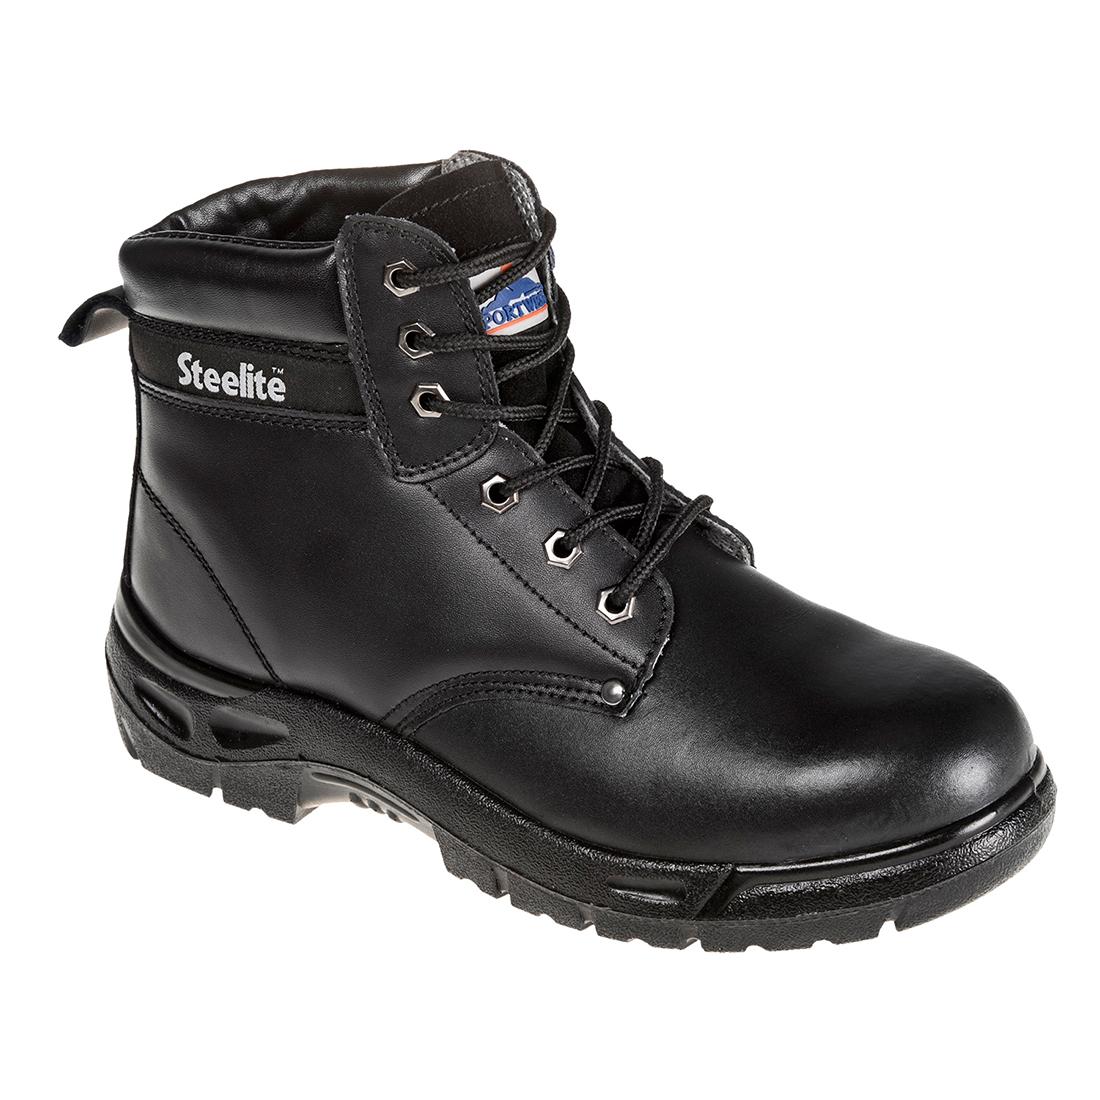 S3 Steelite Boot 46/11 Black 46